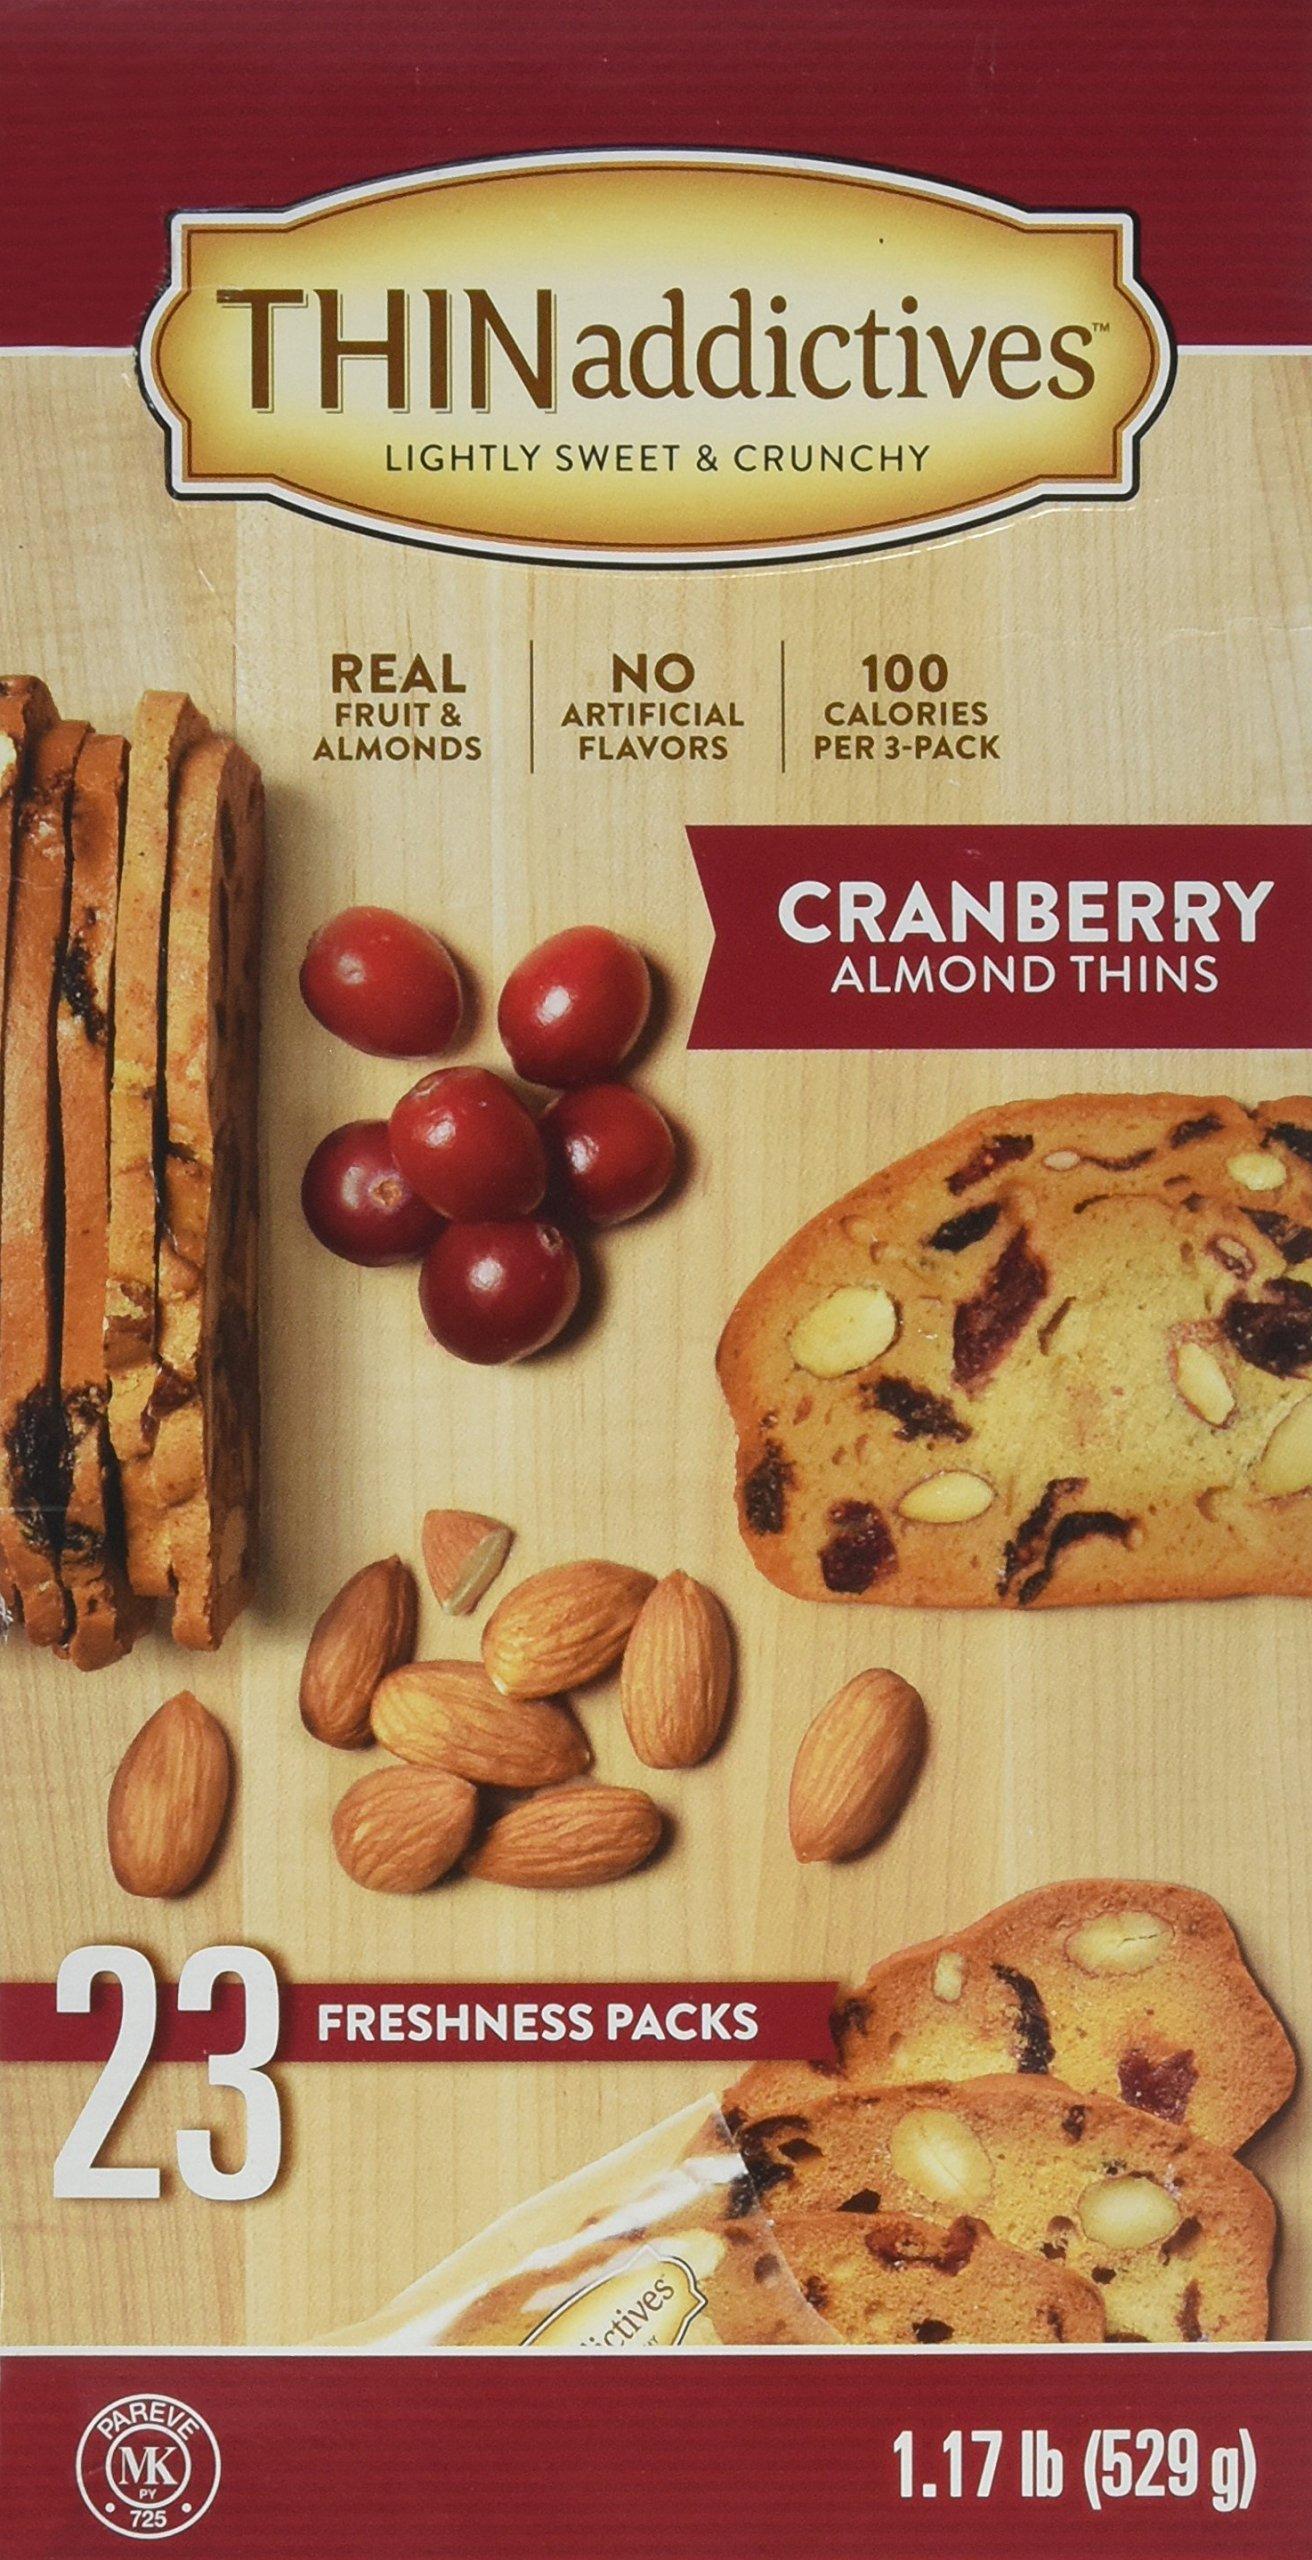 Thin addictives Cranberry Almond Thins (23 pks) by THINADDICTIVES